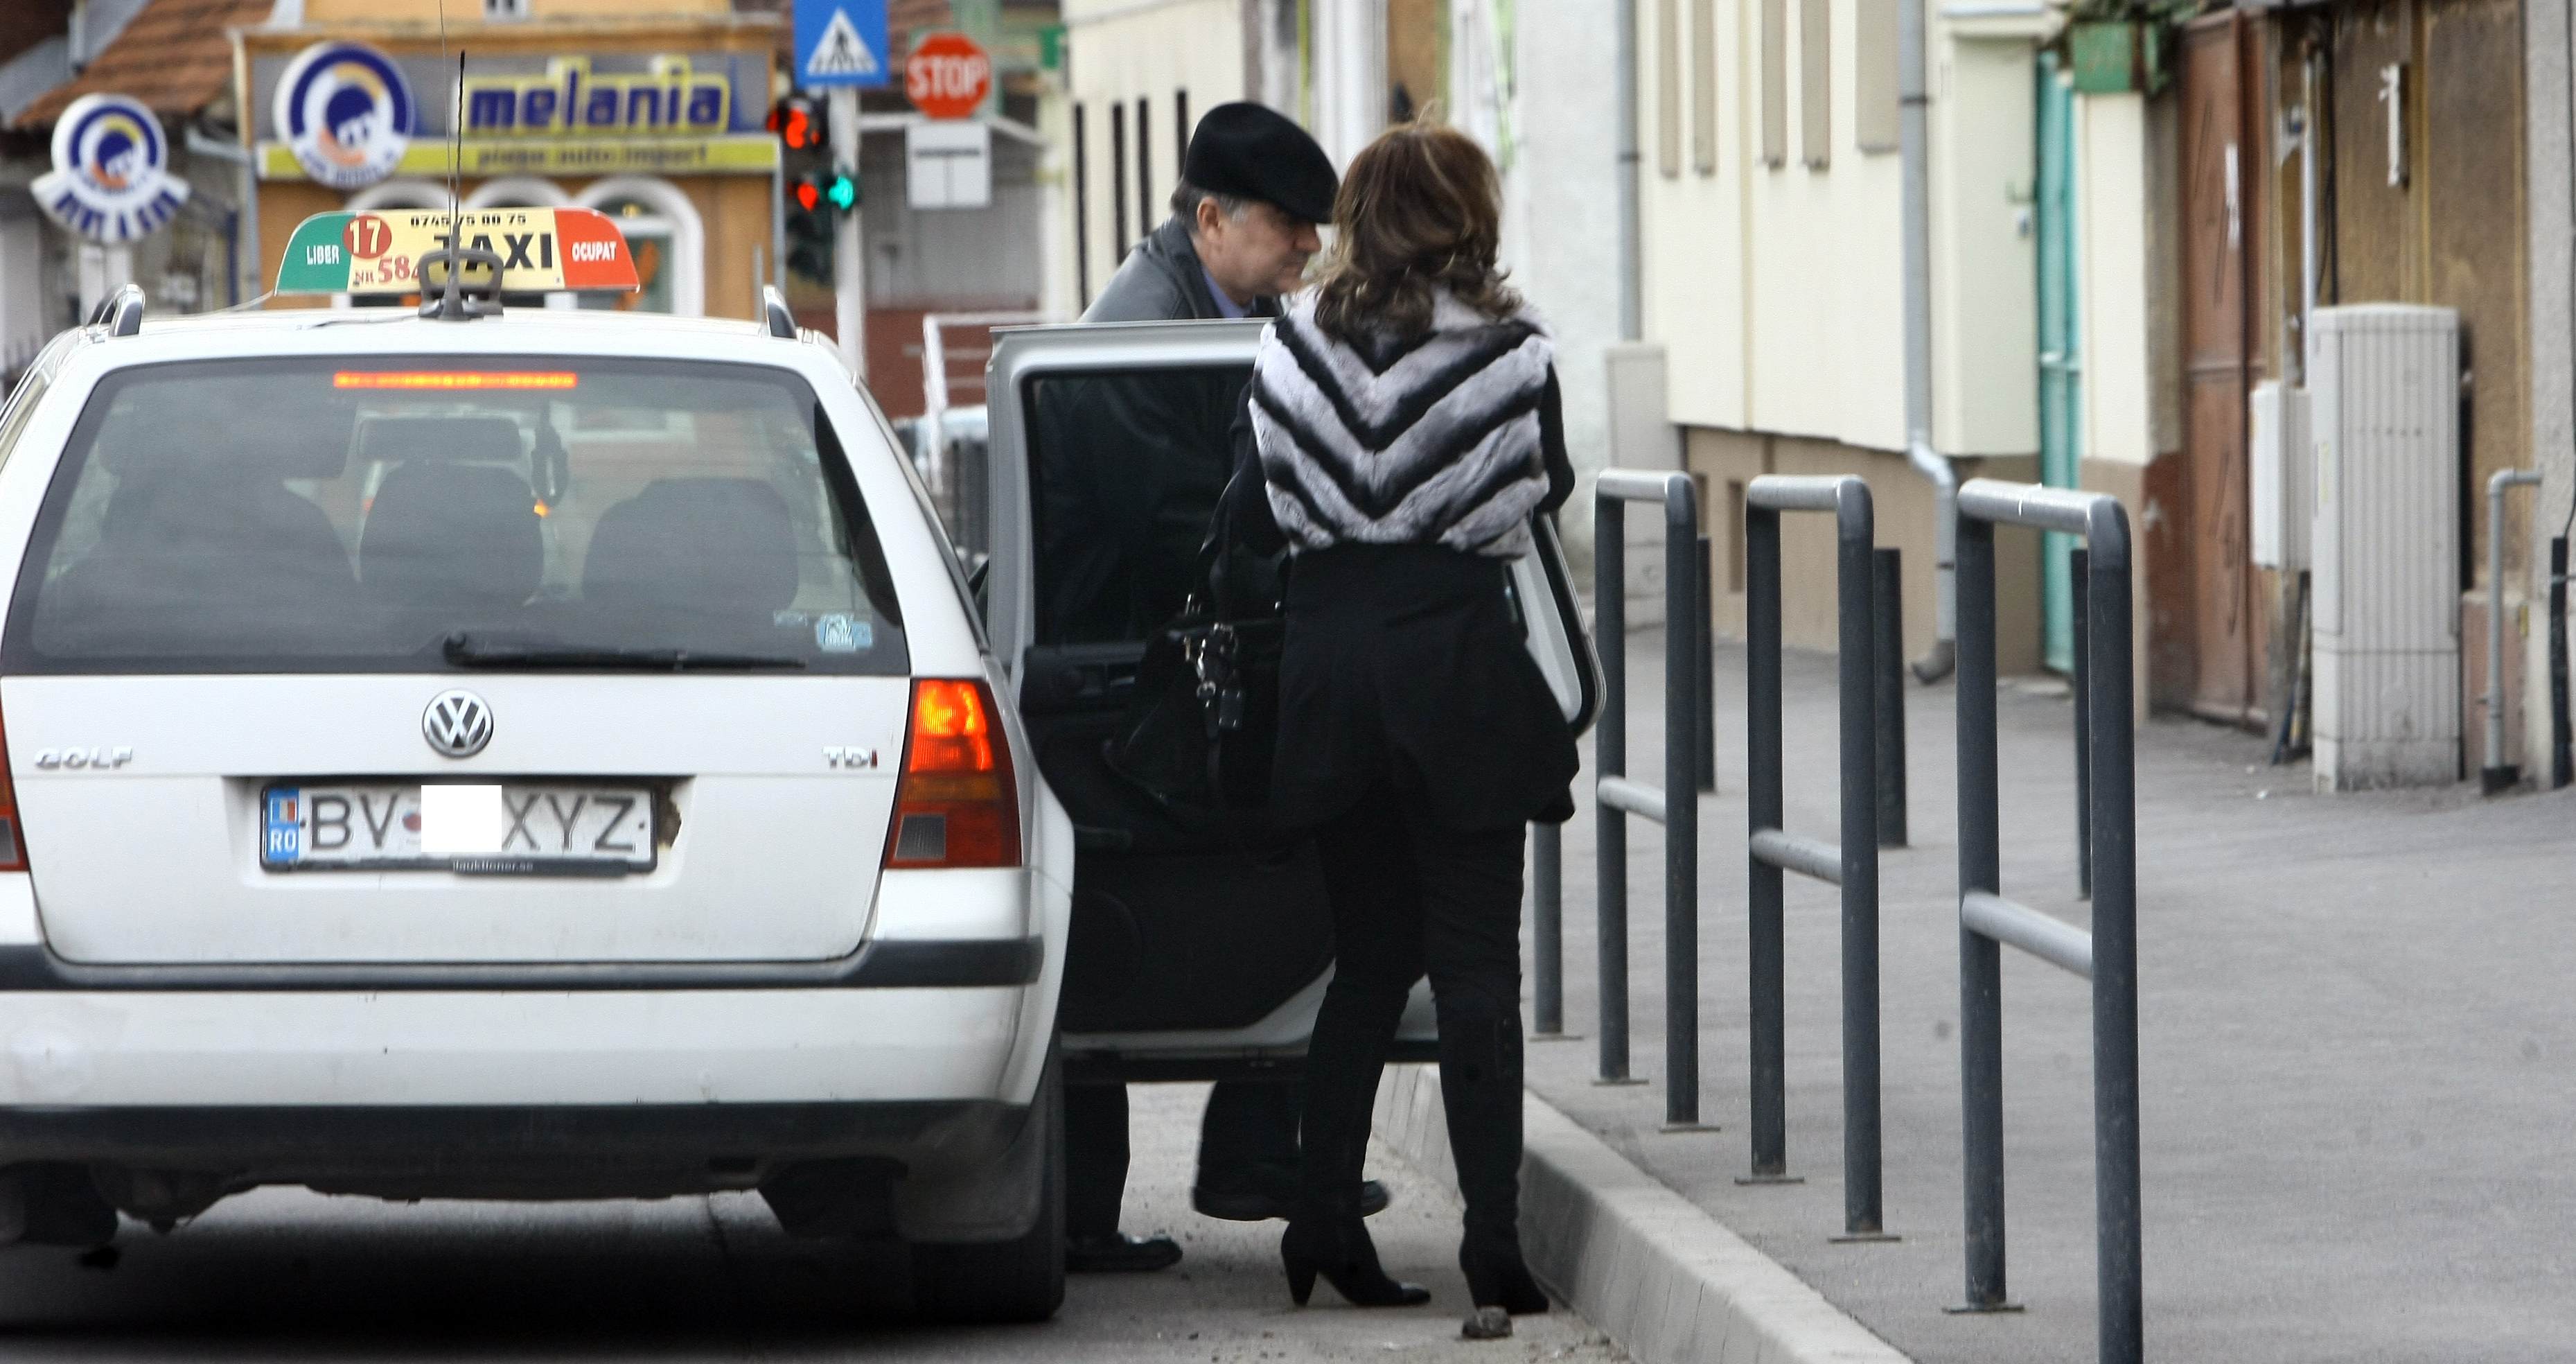 Sotii Ghise coboara din taxi si se mai plimba pret de cateva minute prin oras